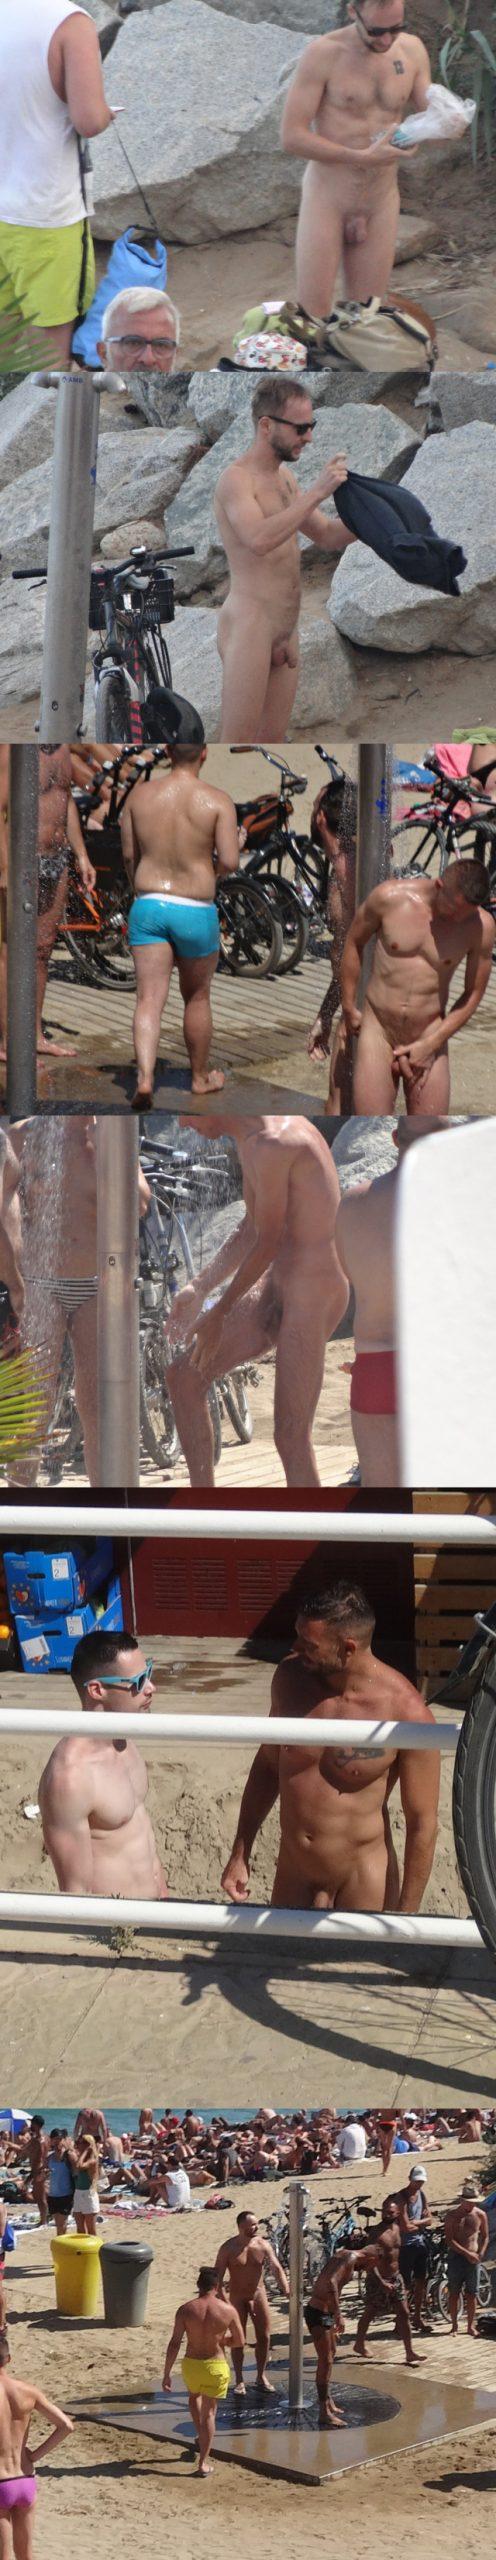 nudist guy caught barcelona beach